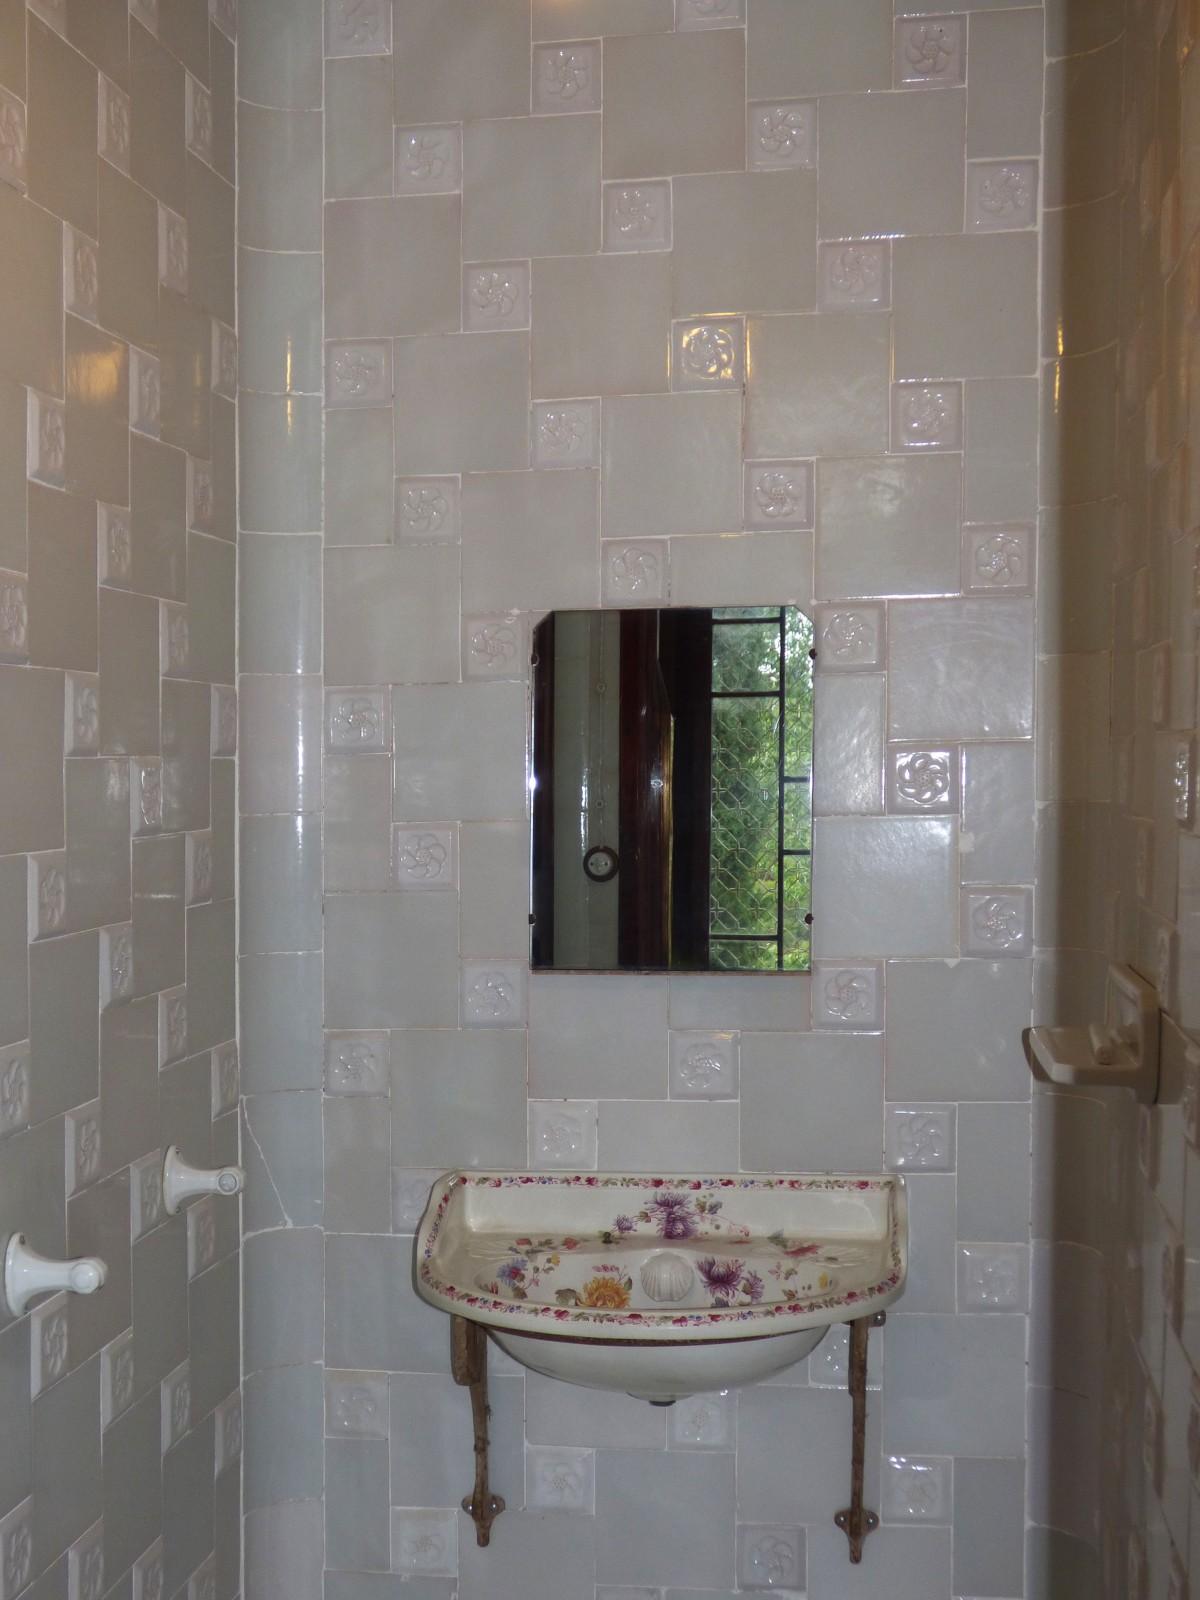 Fotos gratis piso antiguo pared azulejo lavabo for Azulejos para paredes interiores